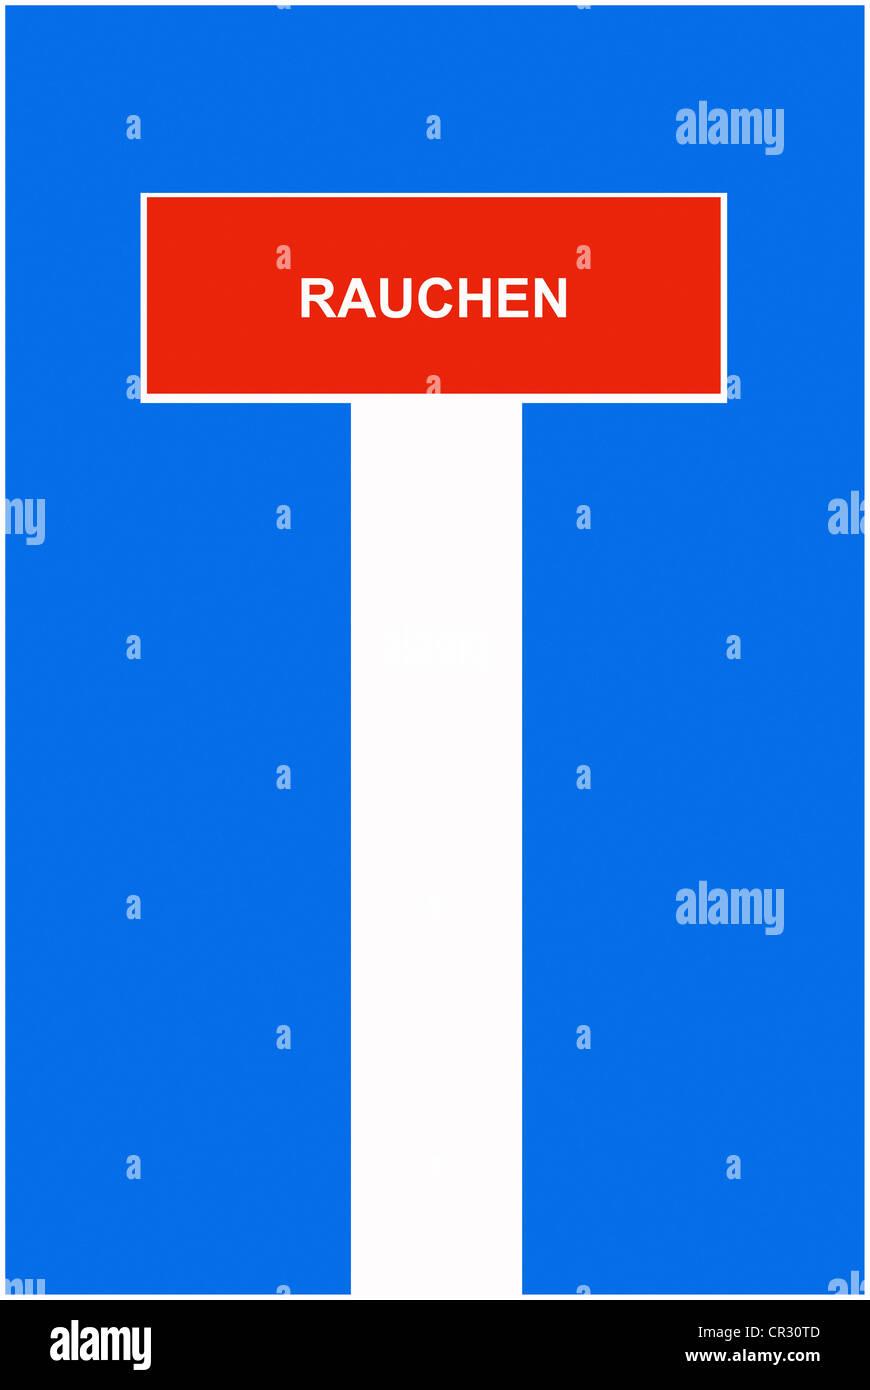 Symbolic image, dead end street, cul-de-sac, Rauchen, German for 'smoking' - Stock Image